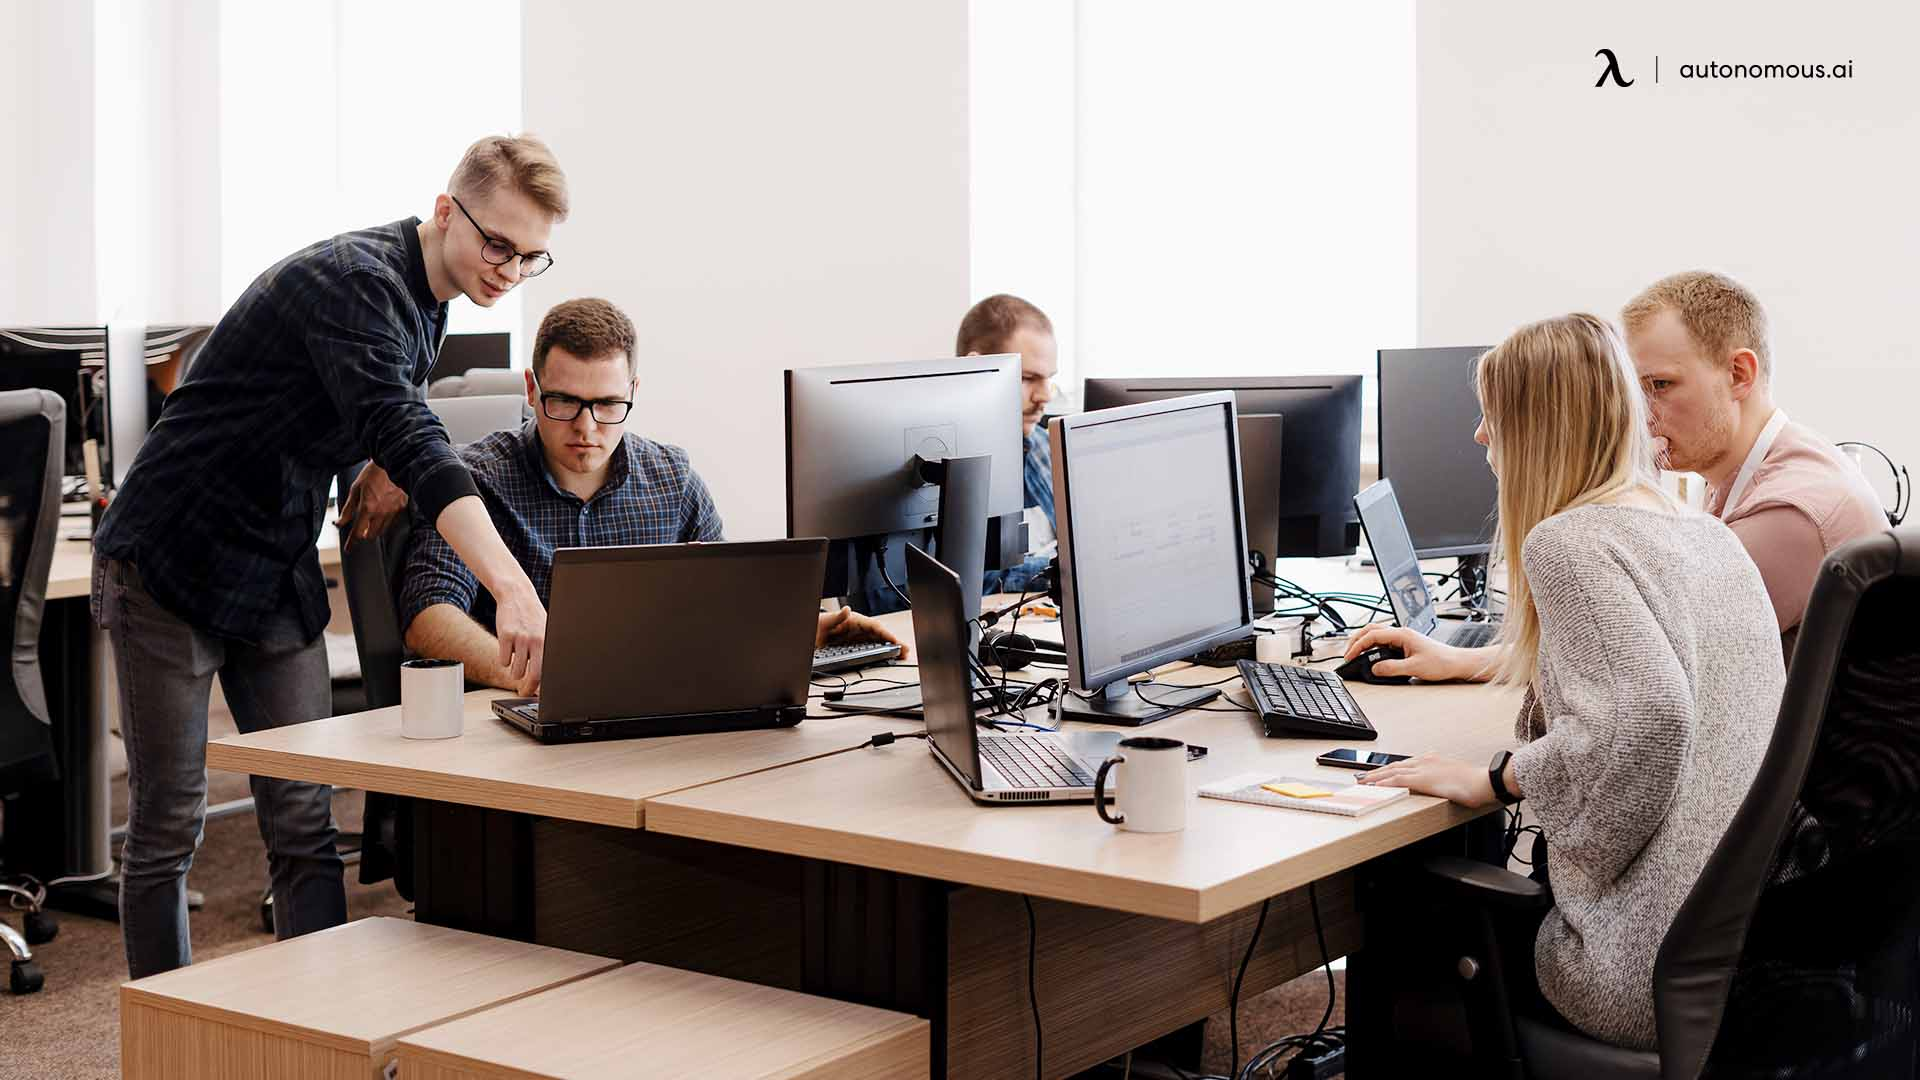 How flexible workspaces promote productivity